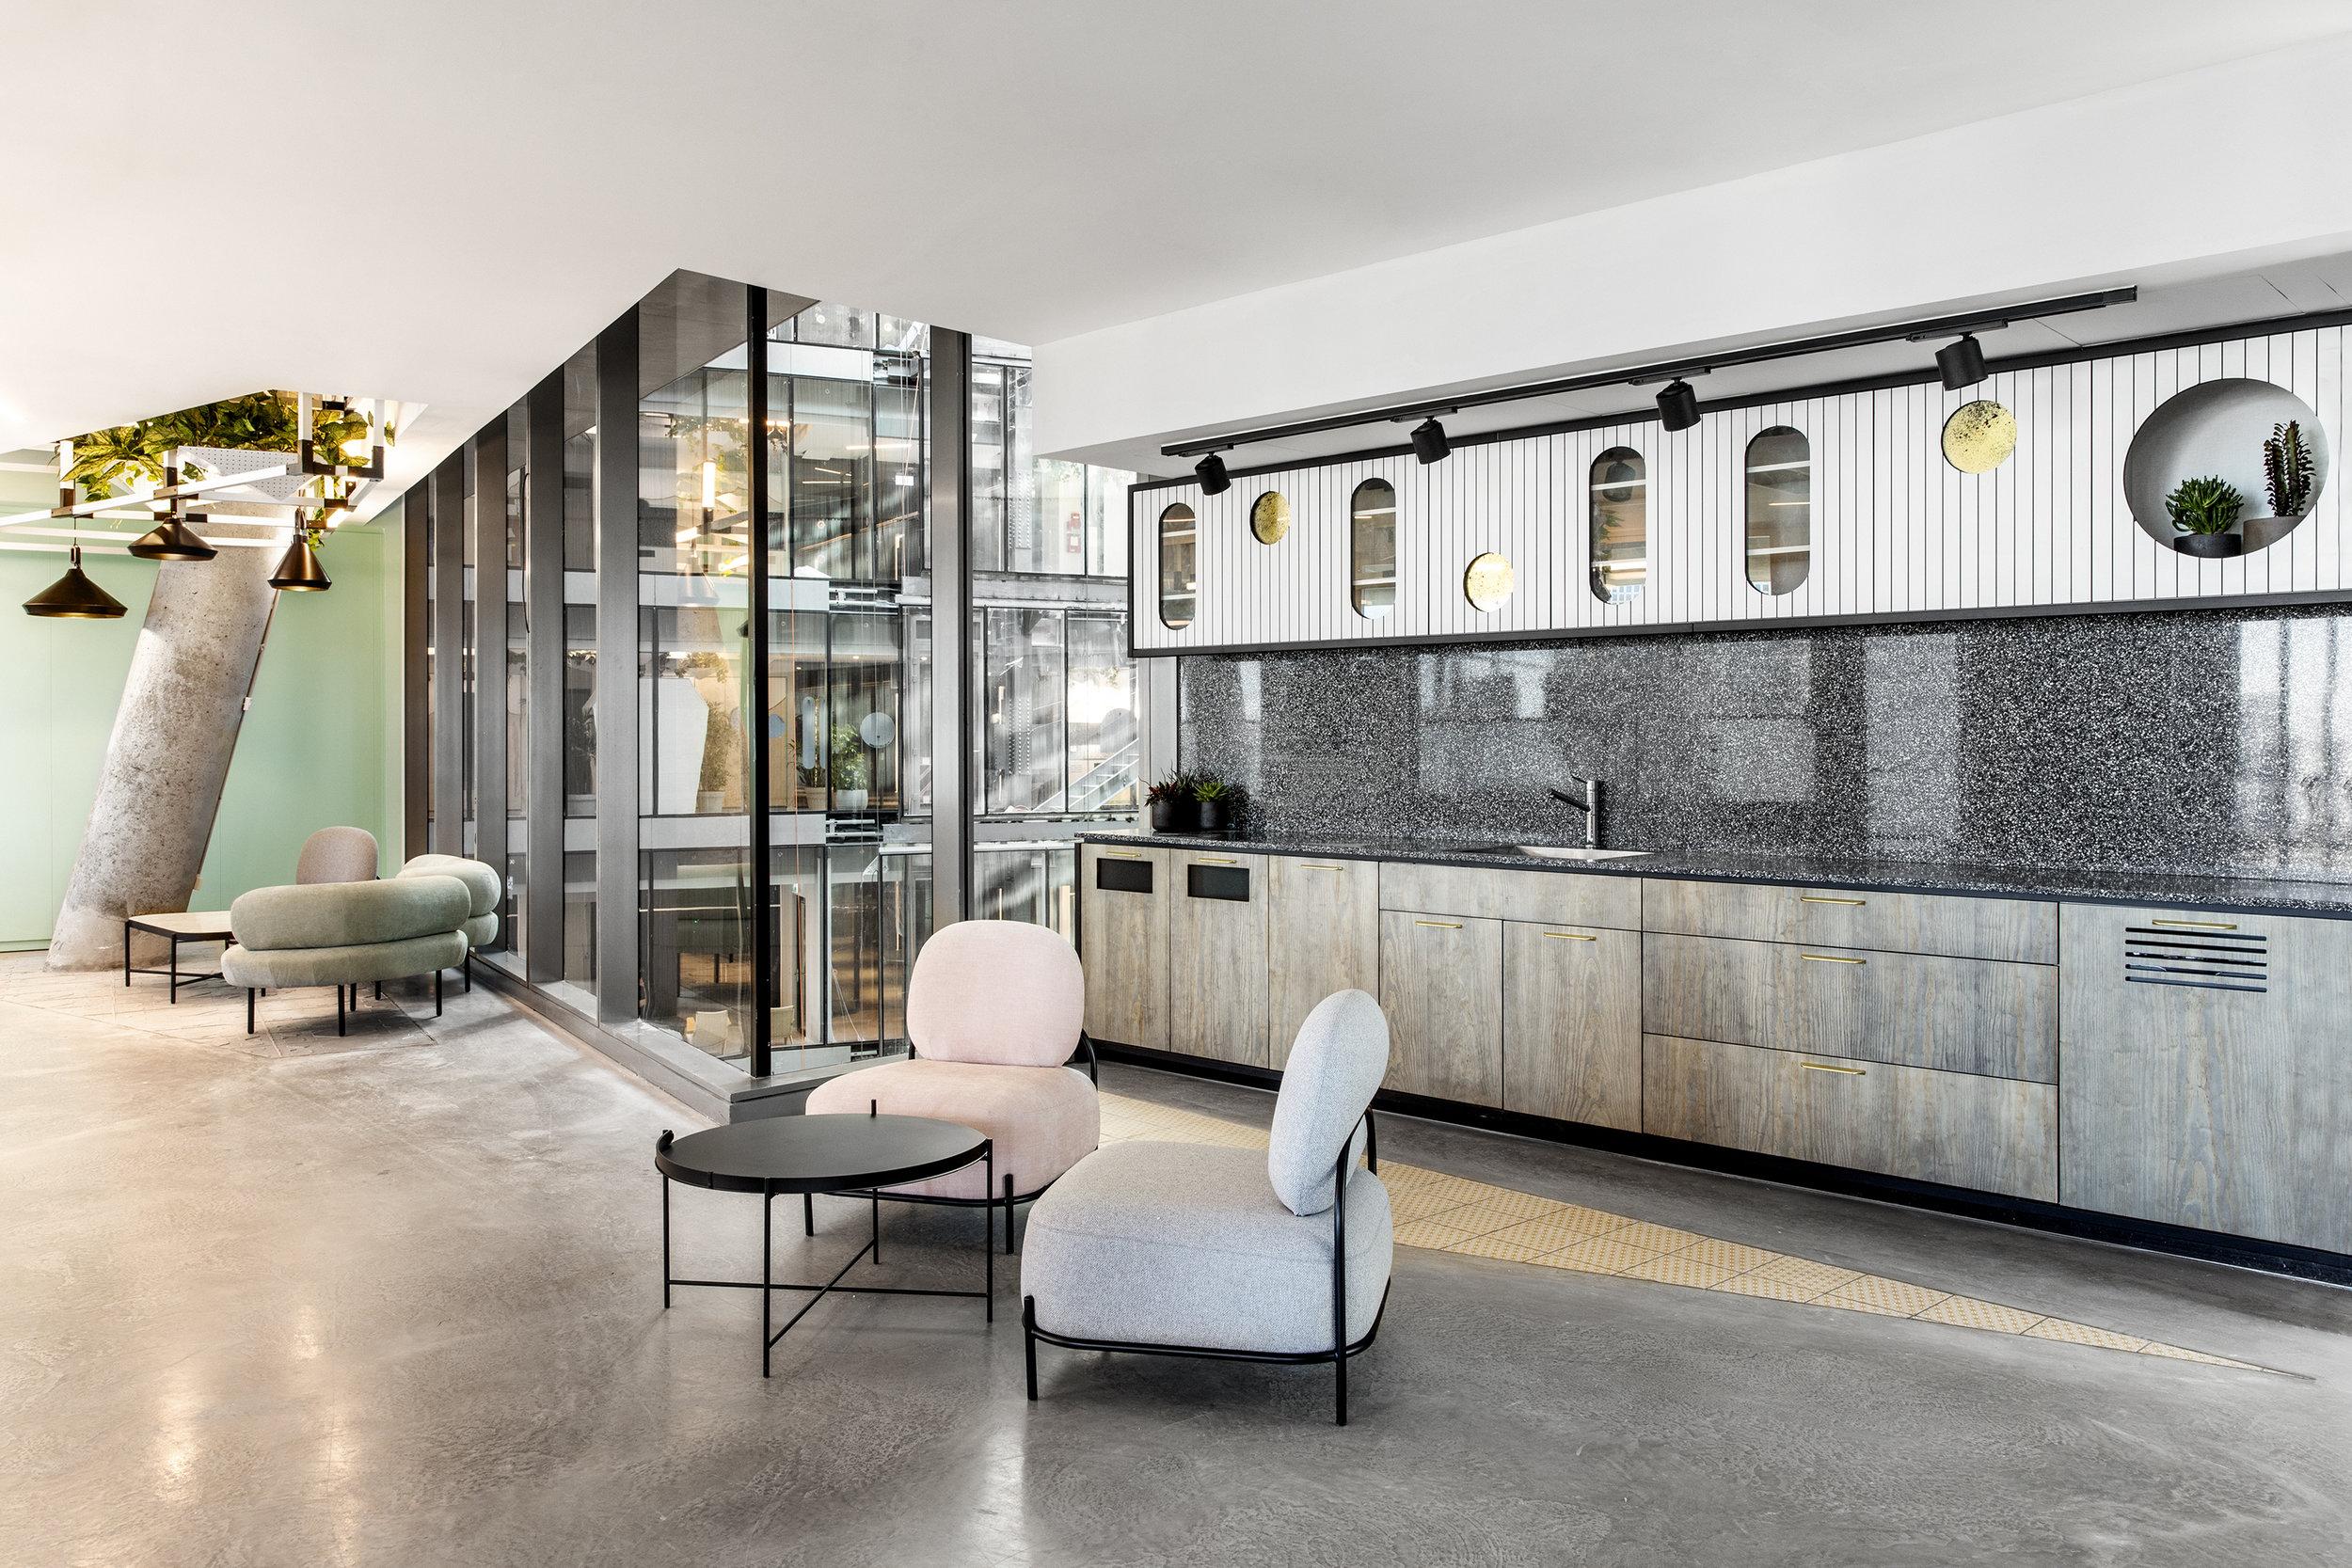 רואי דוד אדריכלות - אדריכל - נטורל אינטליג'נס - ROY DAVID - ARCHITECTURE - ARCHITECT - NI (77).jpg